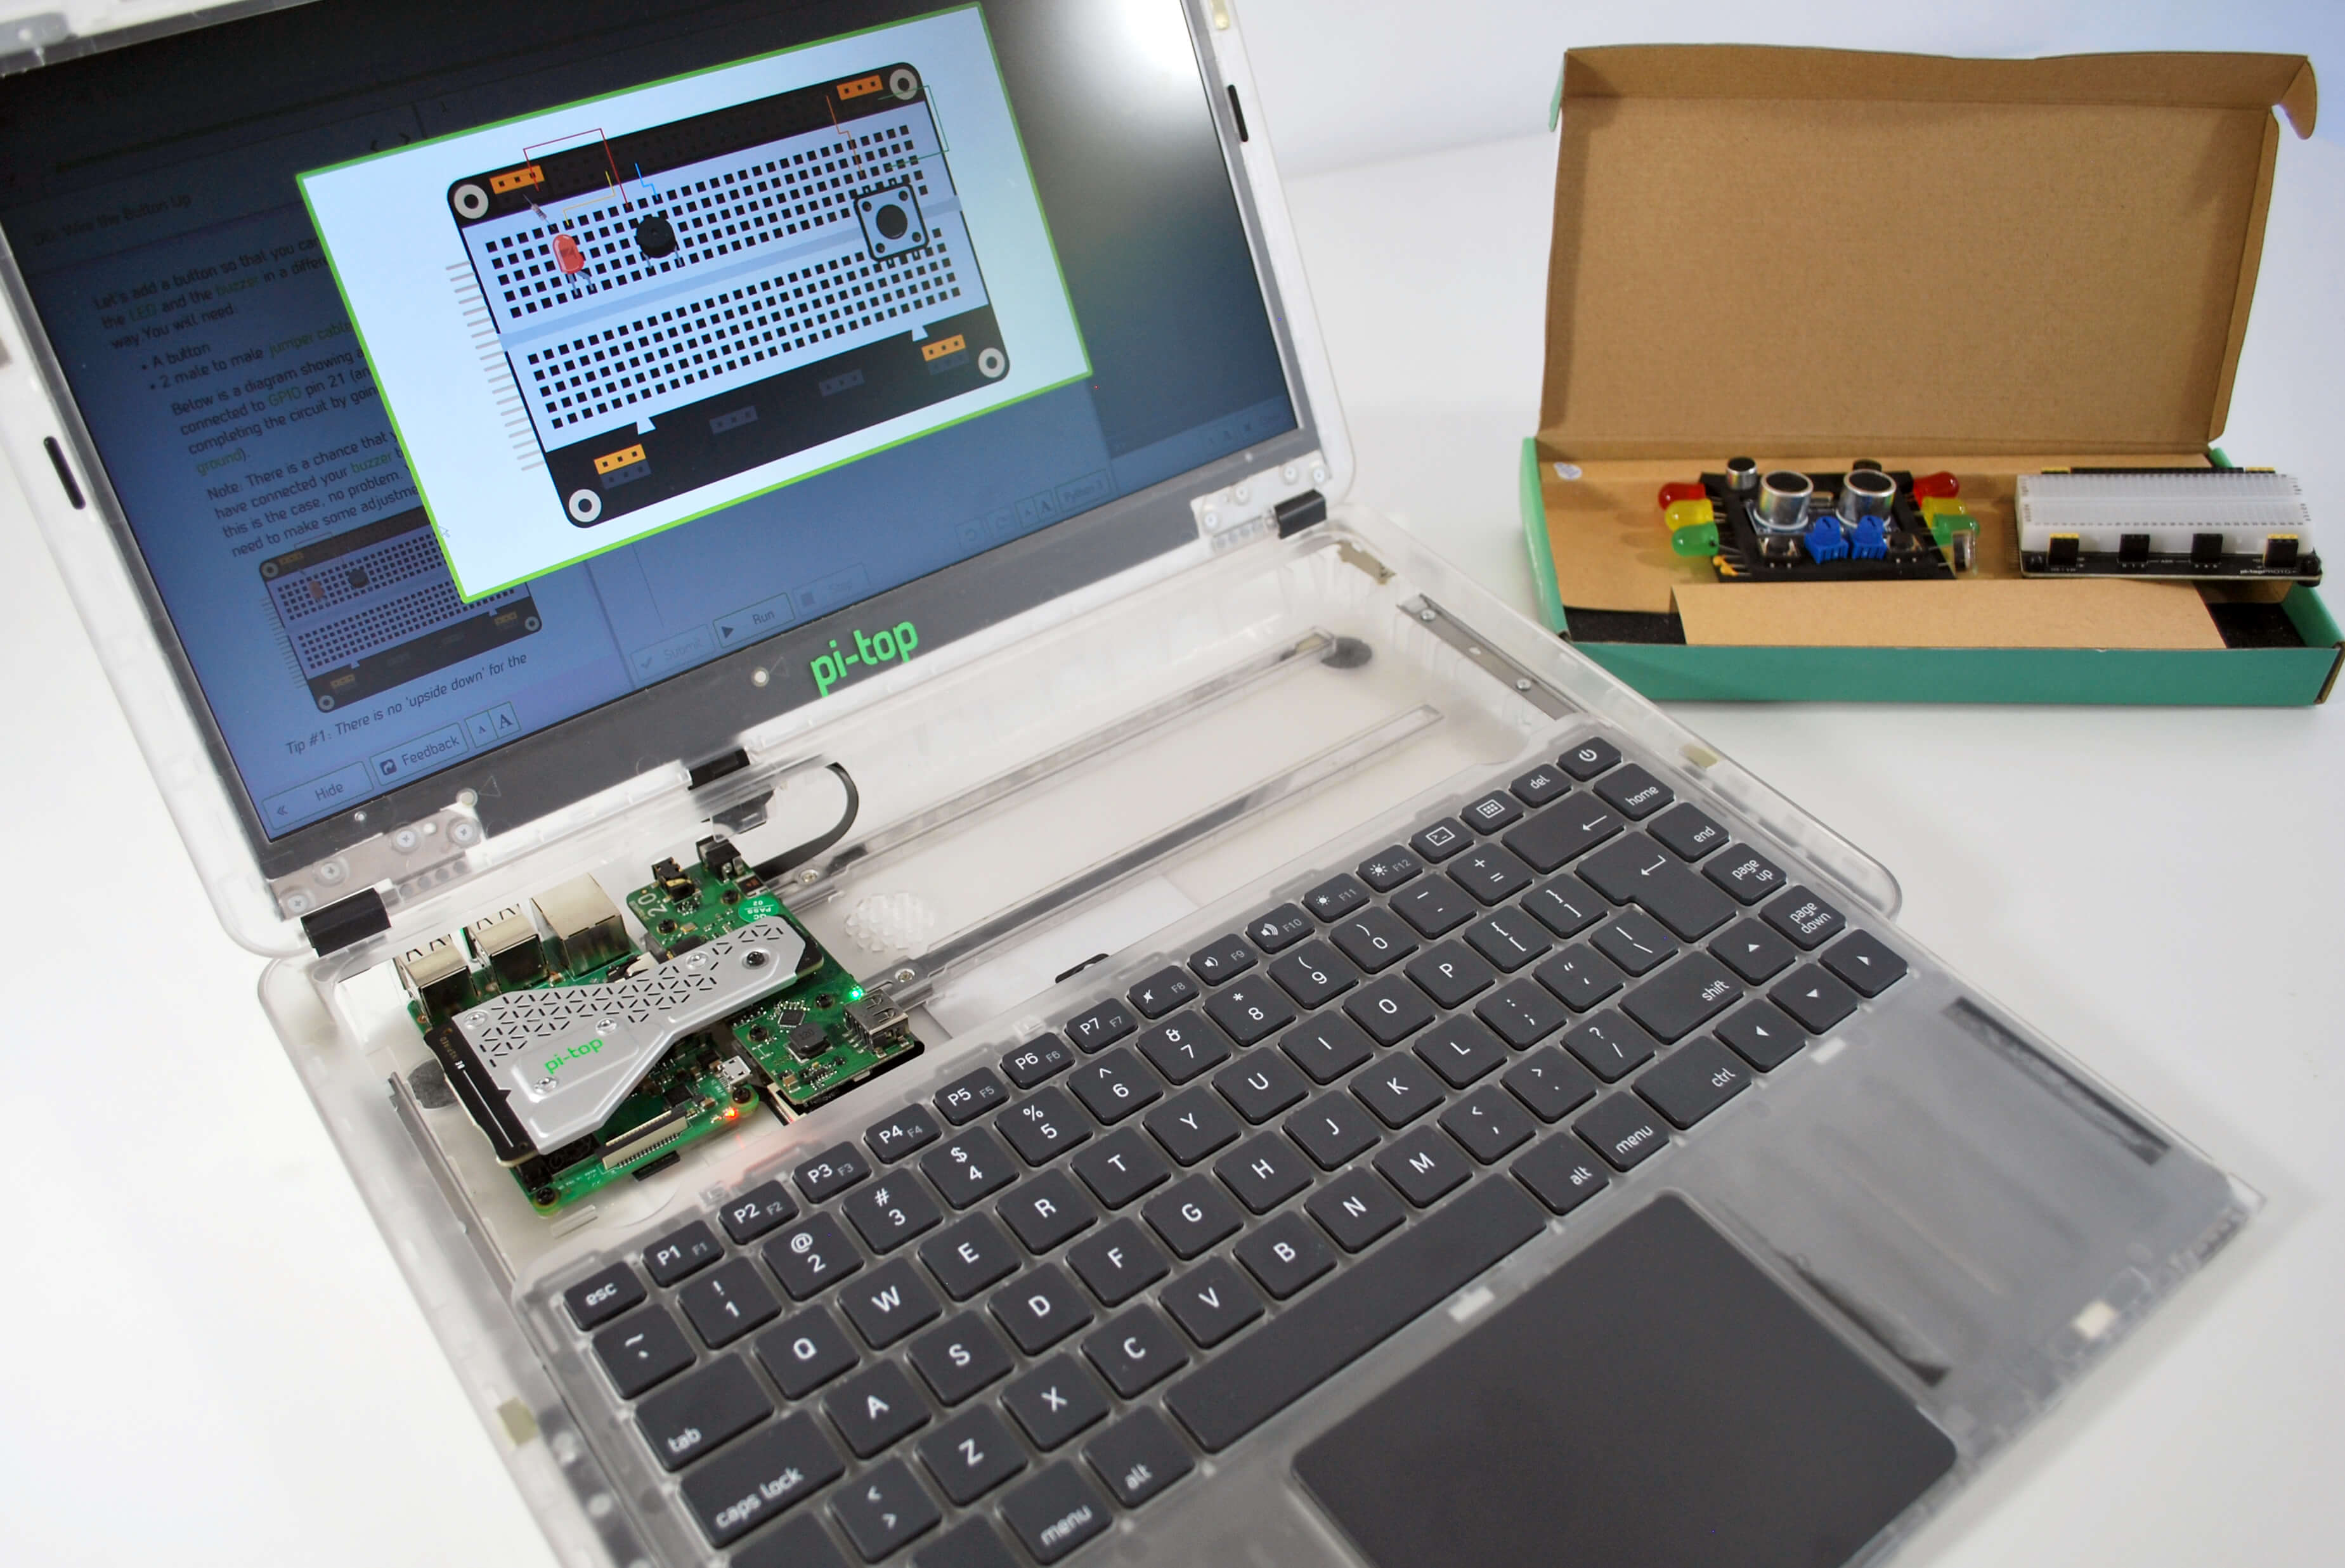 see-thru-pi-top-inventors-kit (1)